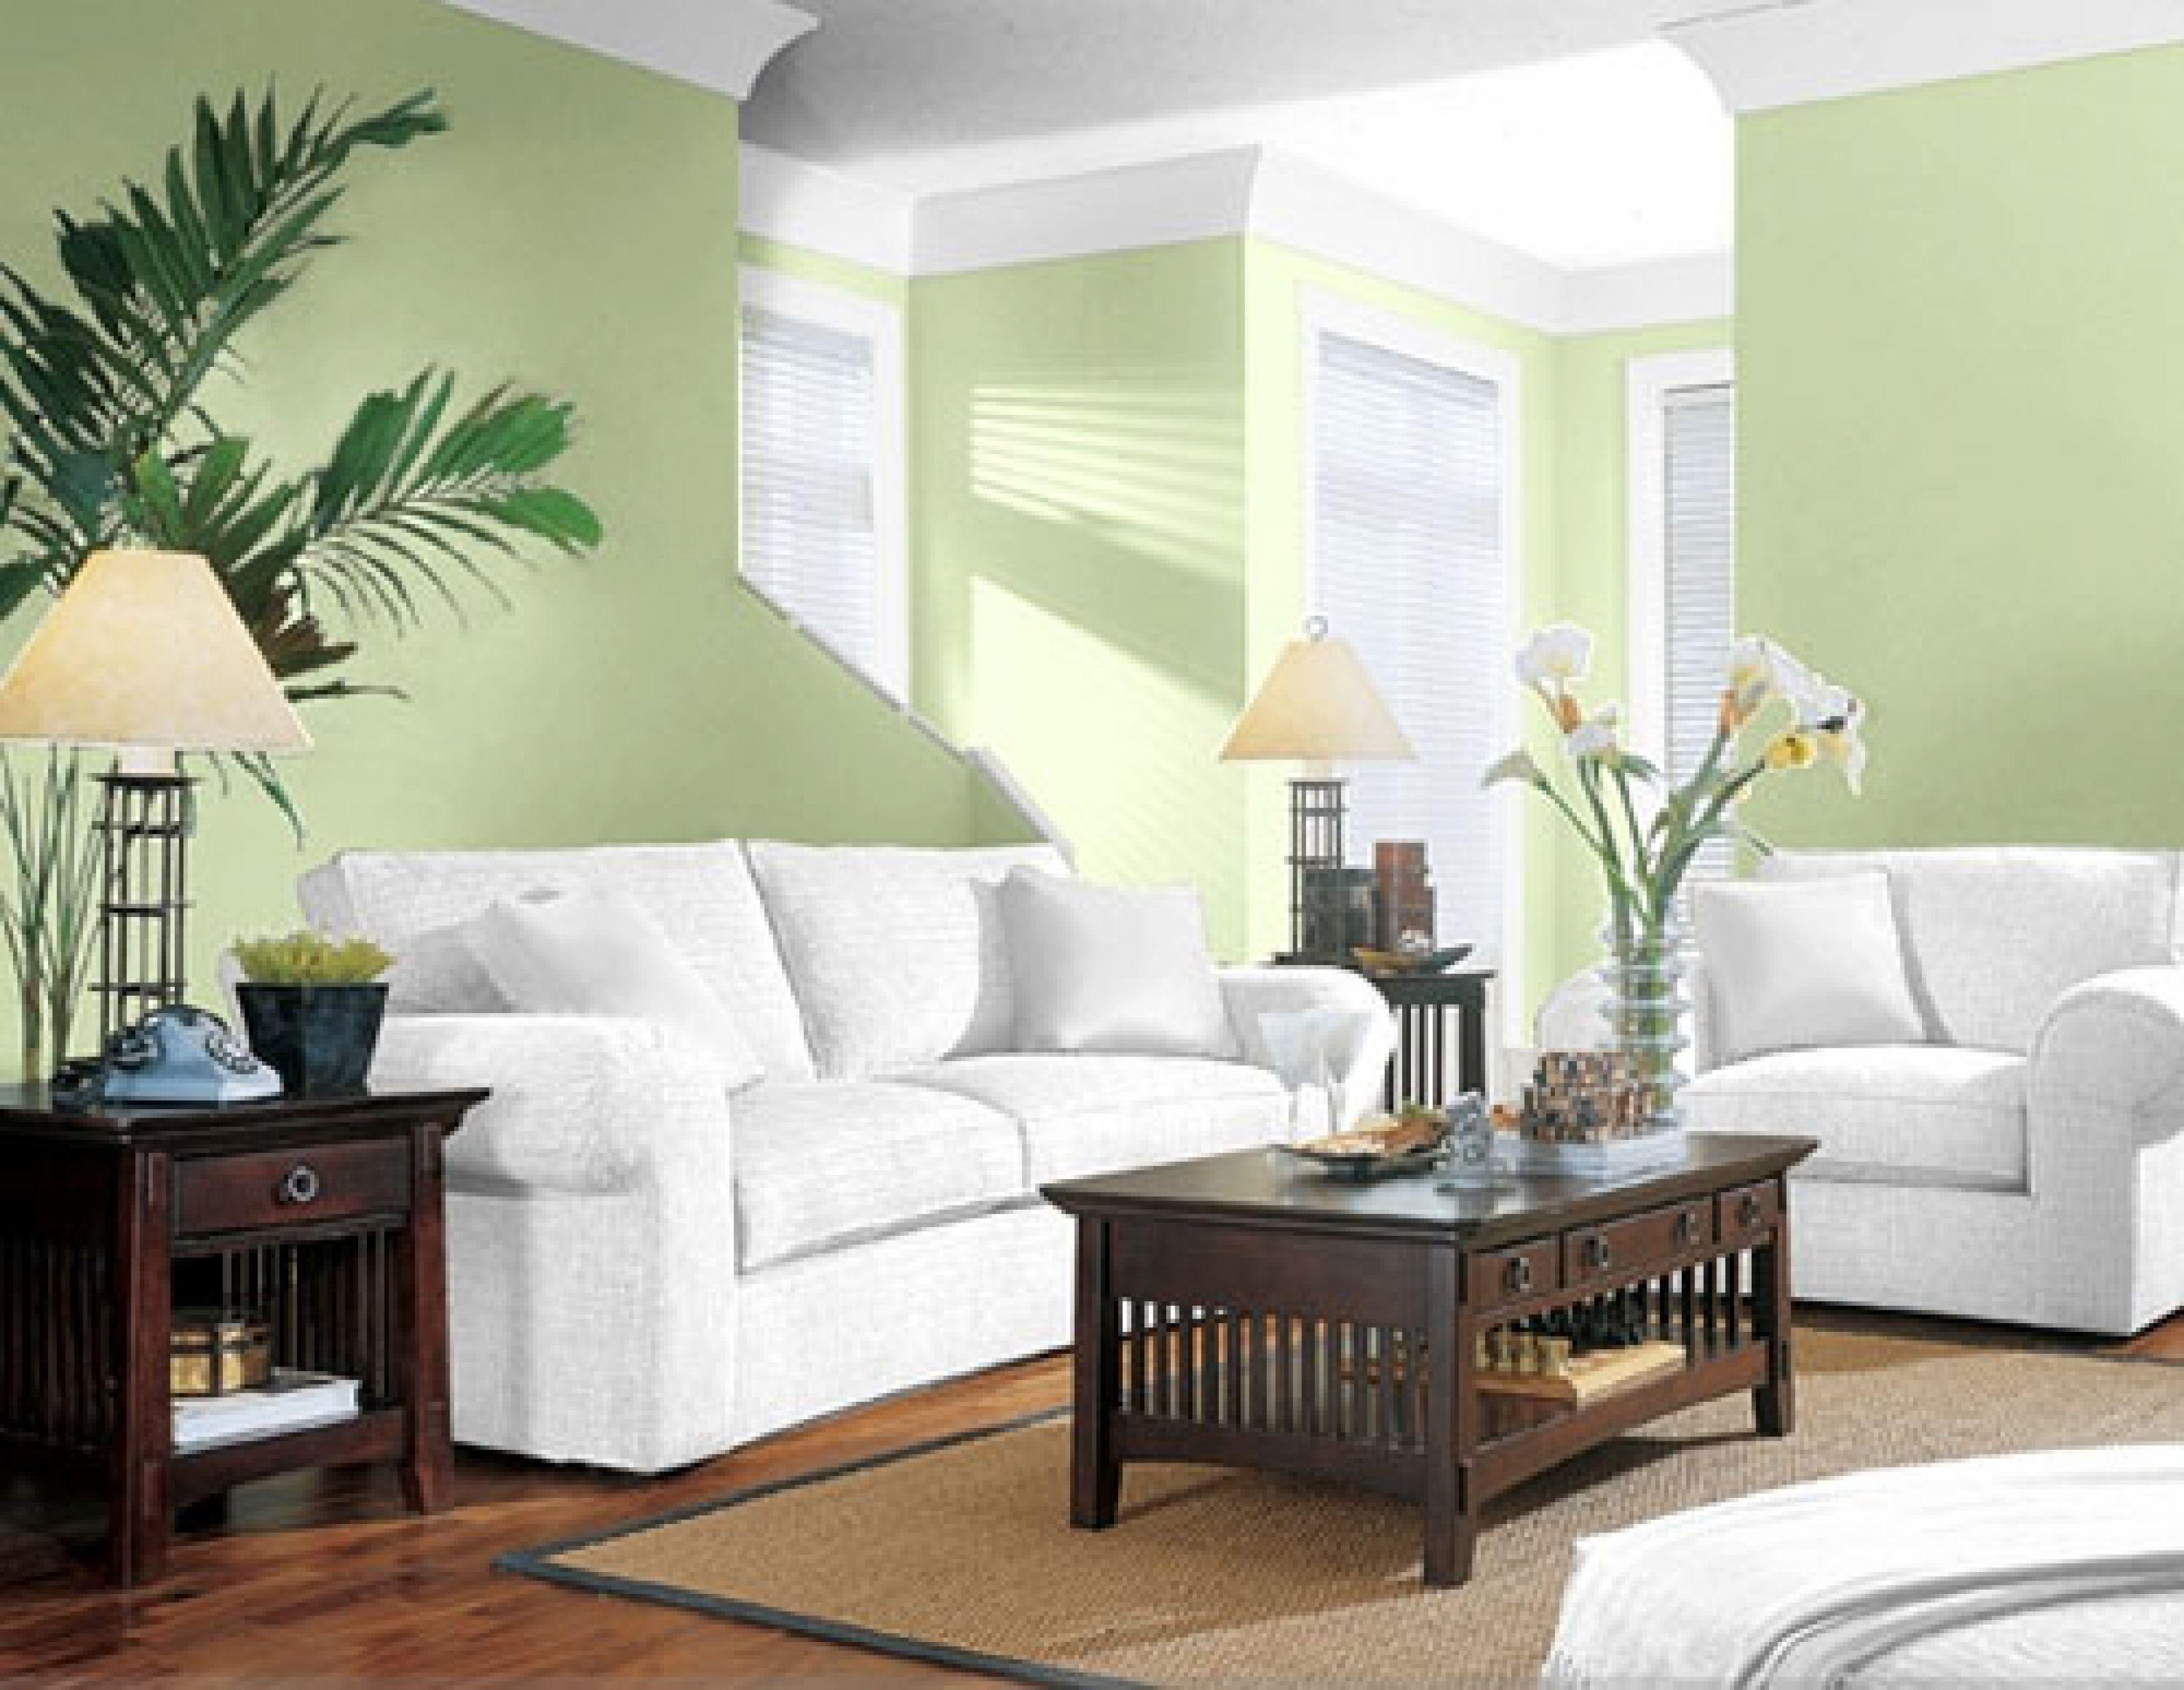 mesmerizing-green-paint-colors-for-living-room-wall-danasoijftop ...